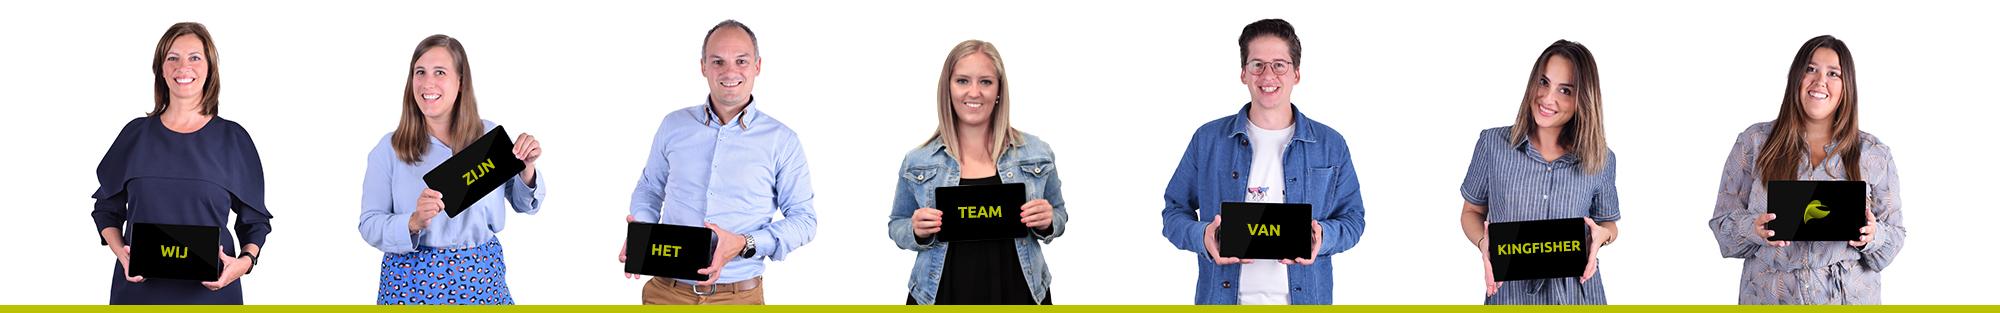 Team Kingfisher marketing